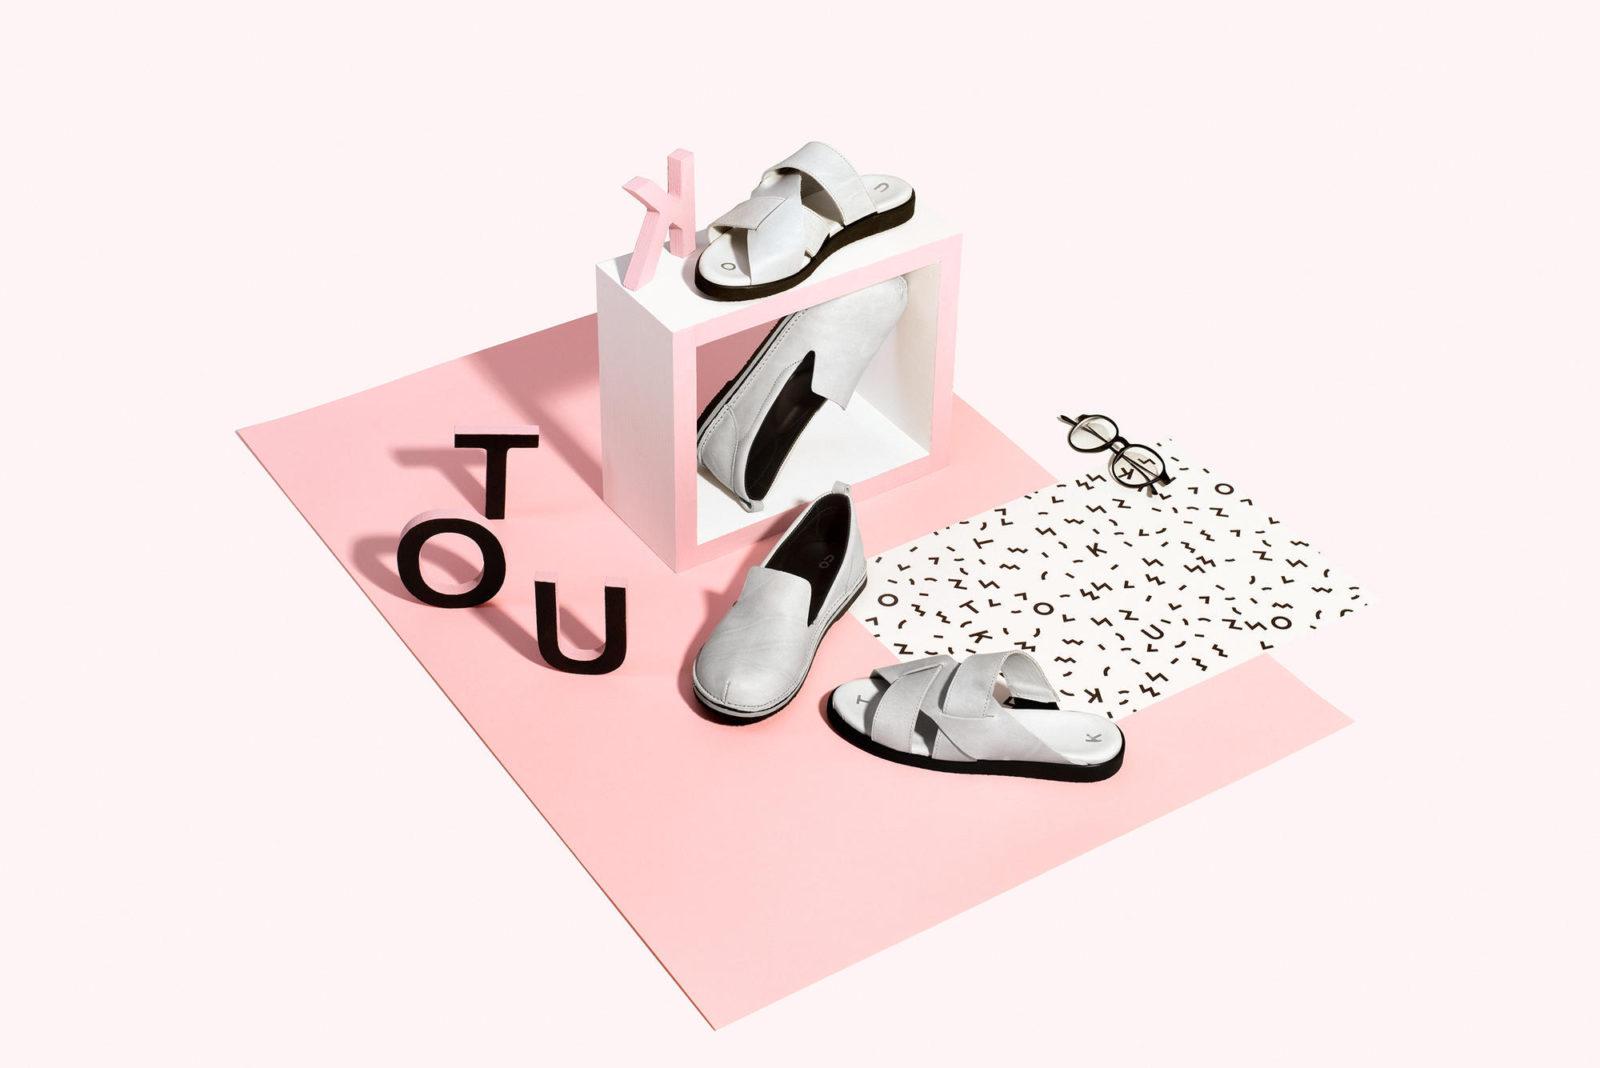 toku-sandals-gray-collab